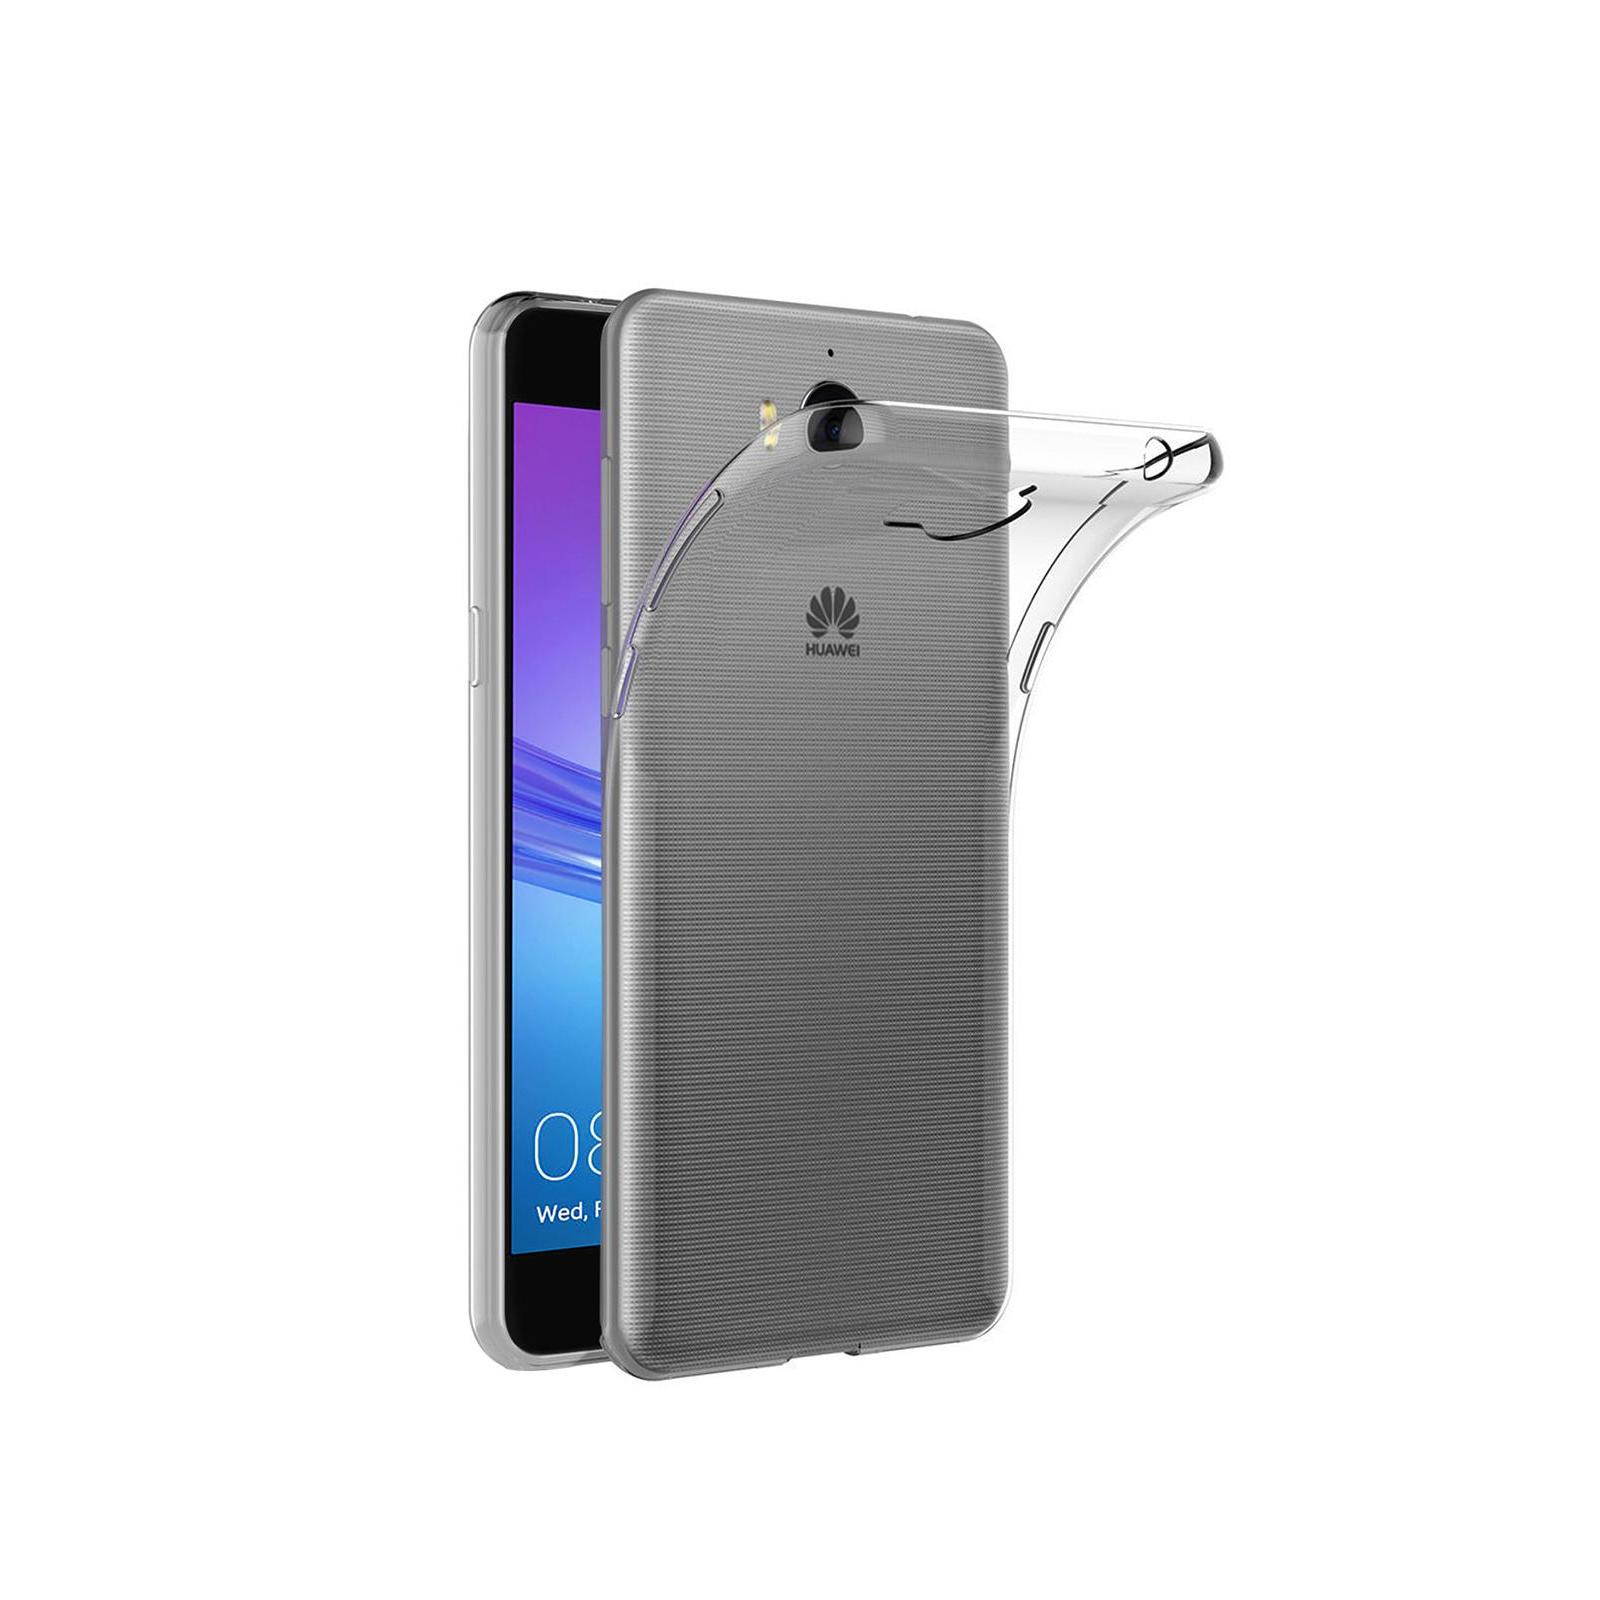 Чехол для моб. телефона SmartCase Huawei Y5 2017 TPU Clear (SC-HY517) изображение 2